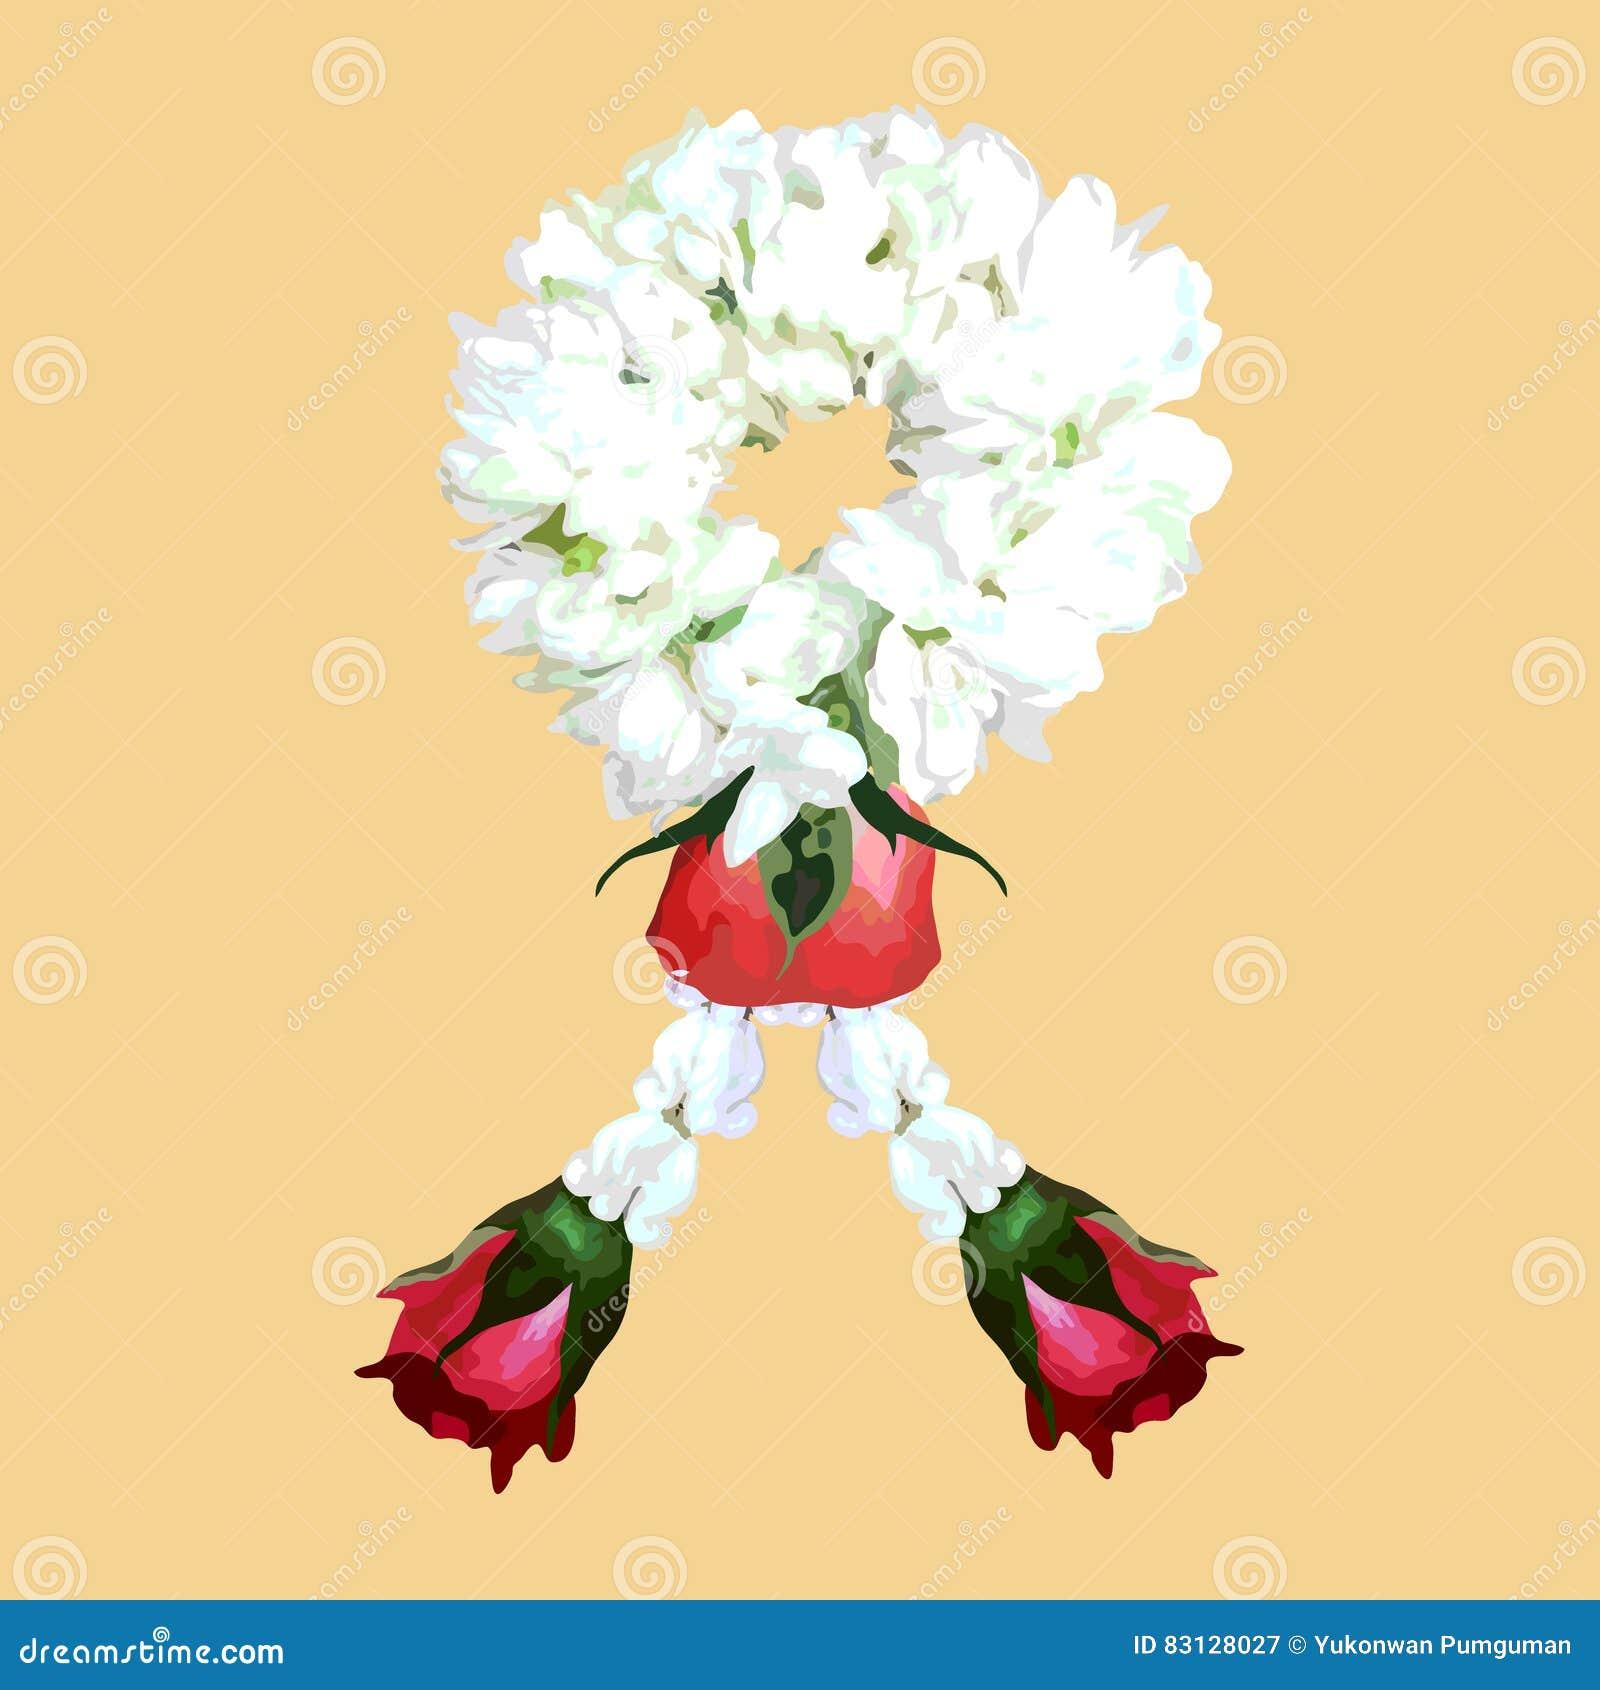 Thai Traditional Jasmine Flower Garland Illustration Vector